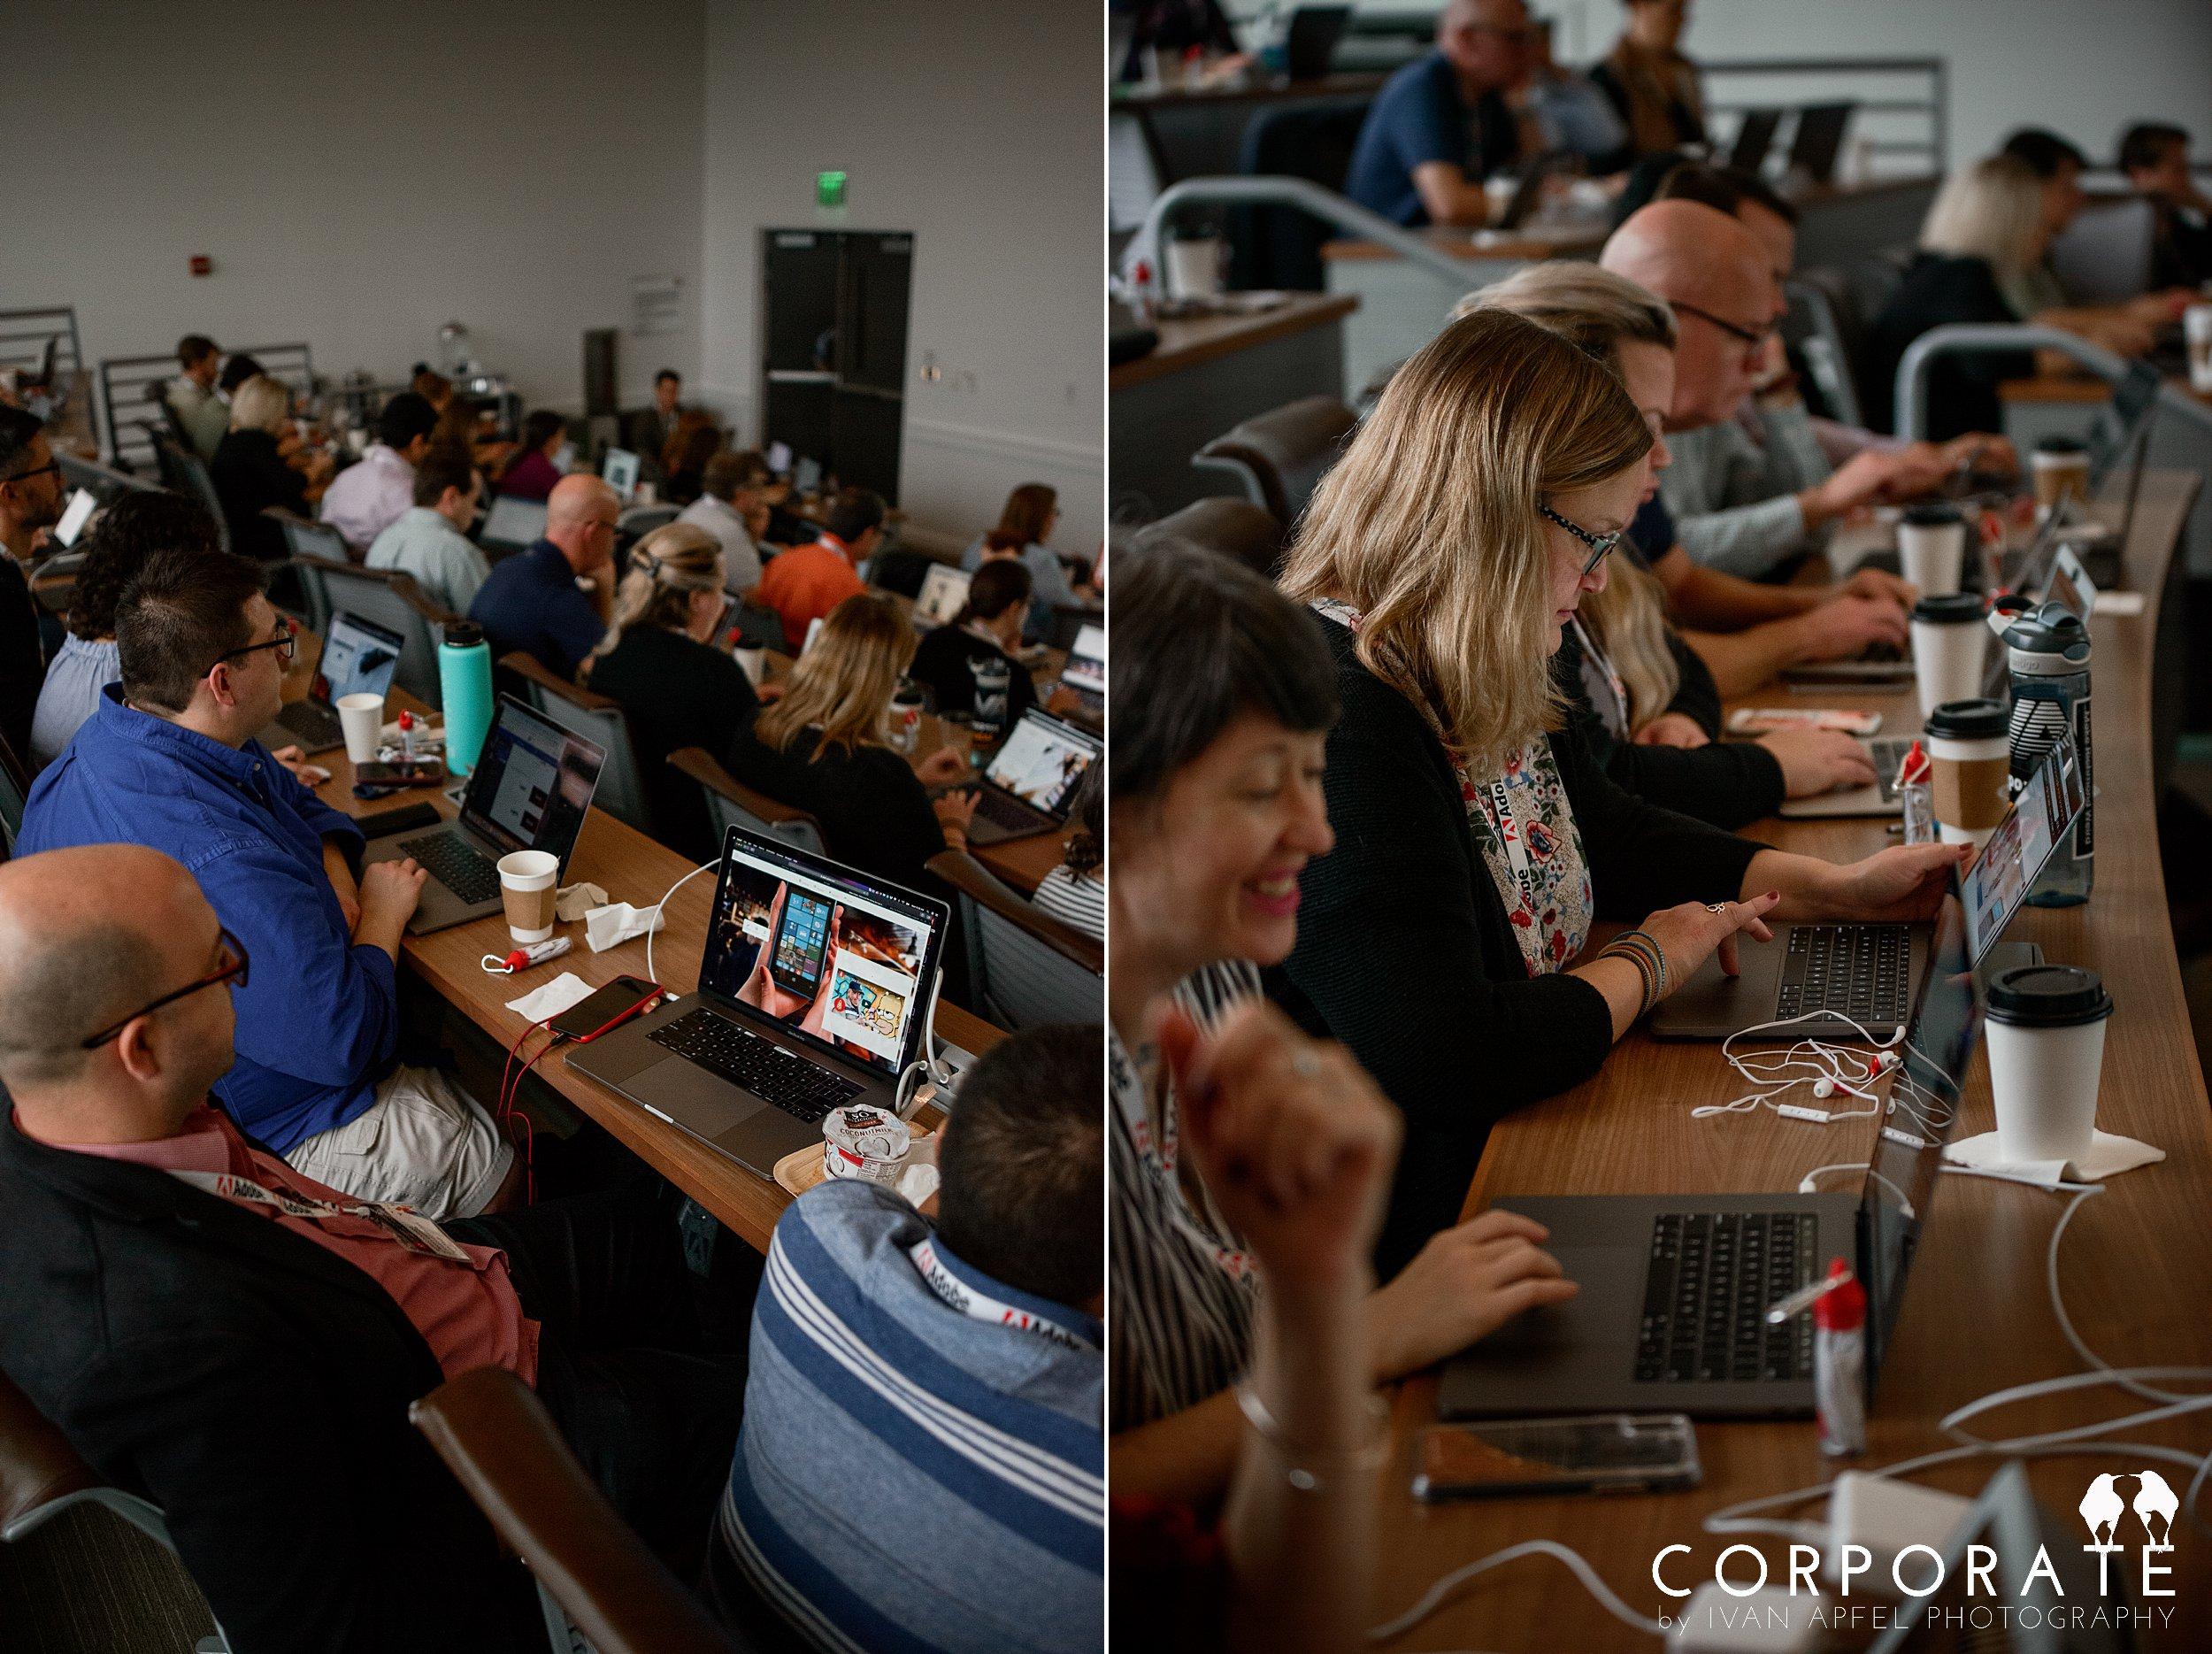 Miami Corporate Event Photographer Adobe Systems Creative Campus 2019-D3_Adobe_Creative_Campus_UMiami-_IAP0084.jpg